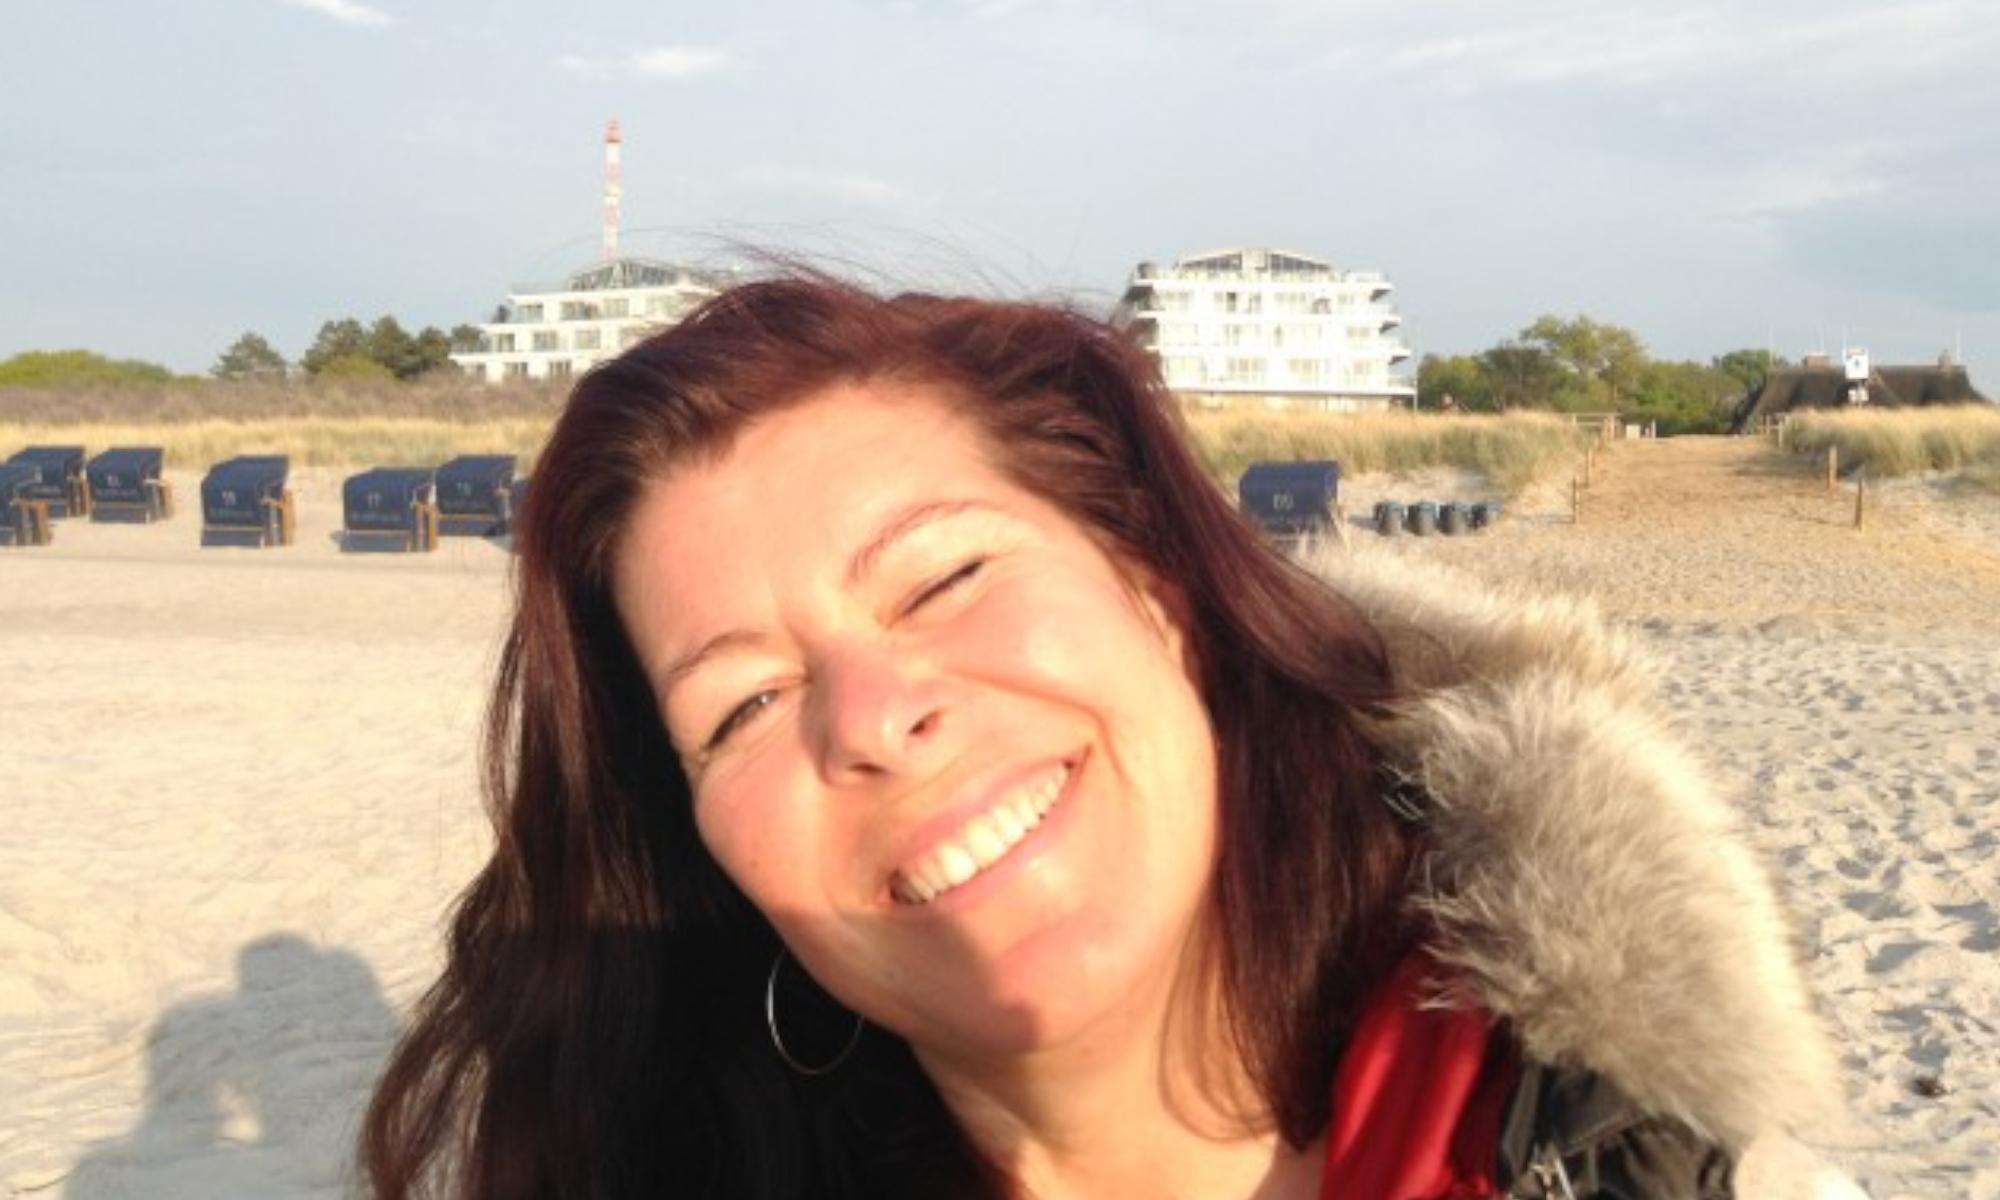 PD-DL_header-smile-beach